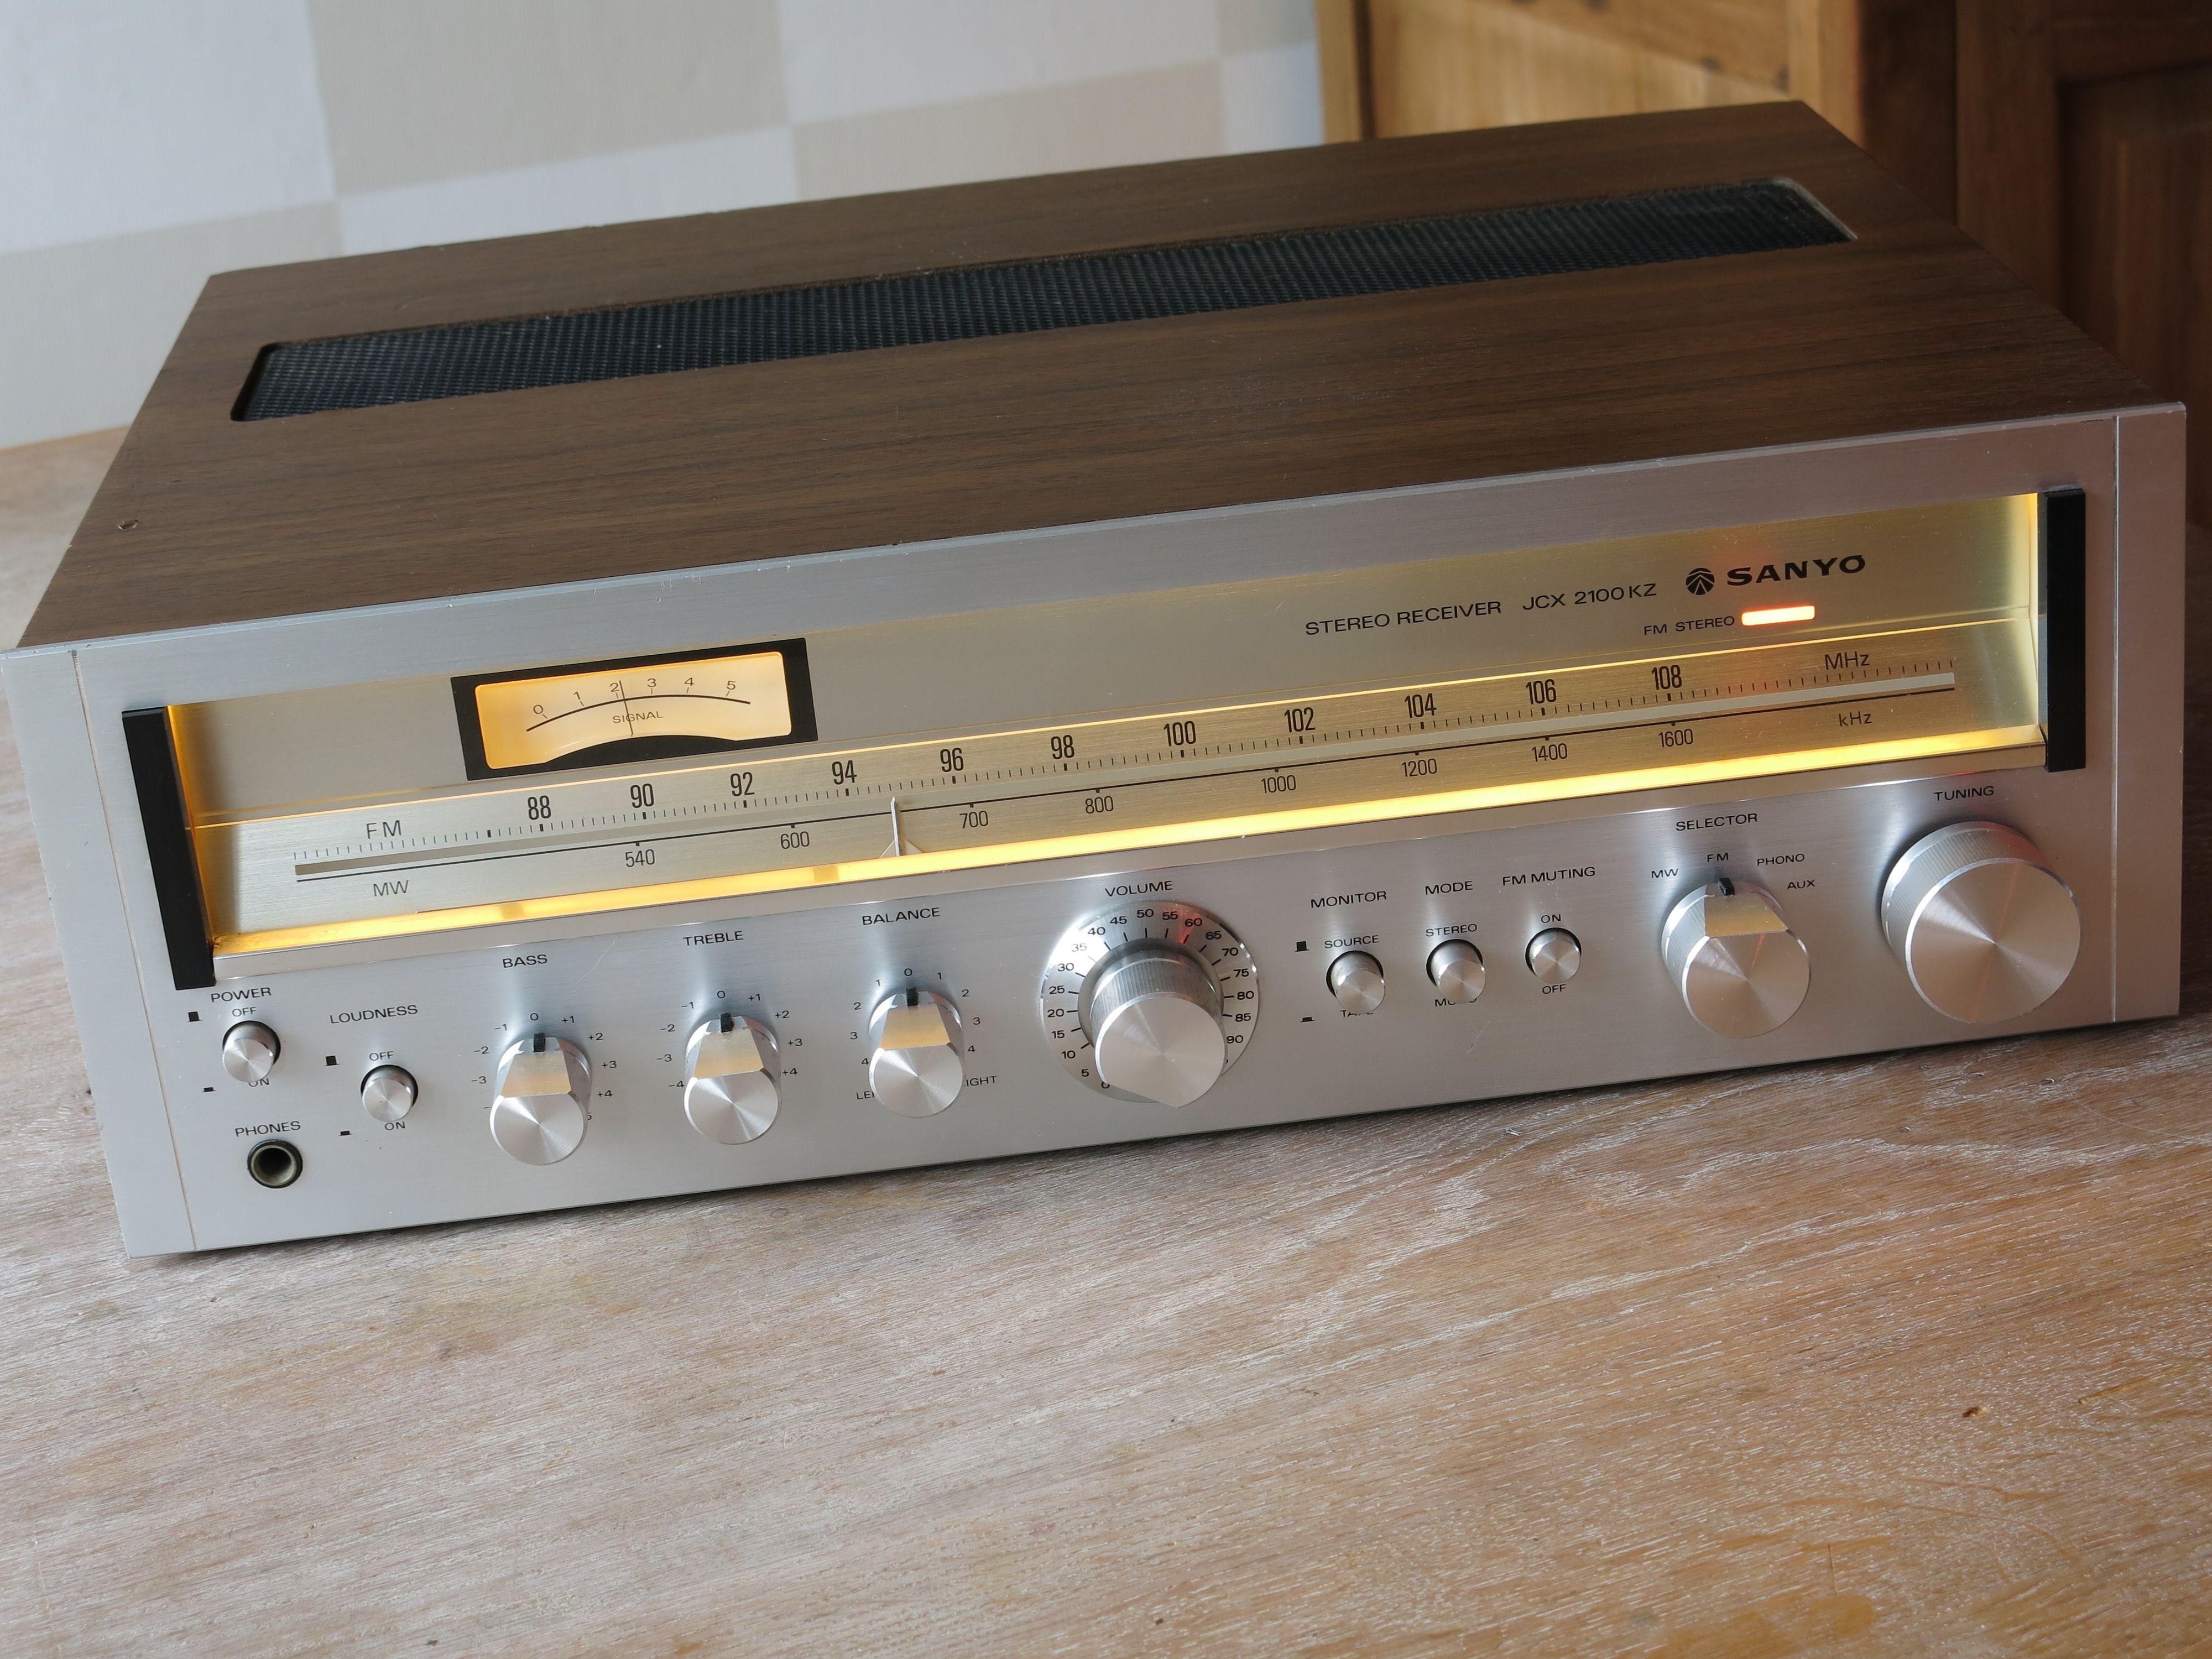 Pin by Methuselahpalooza ! on classic audio equipment | Audio system